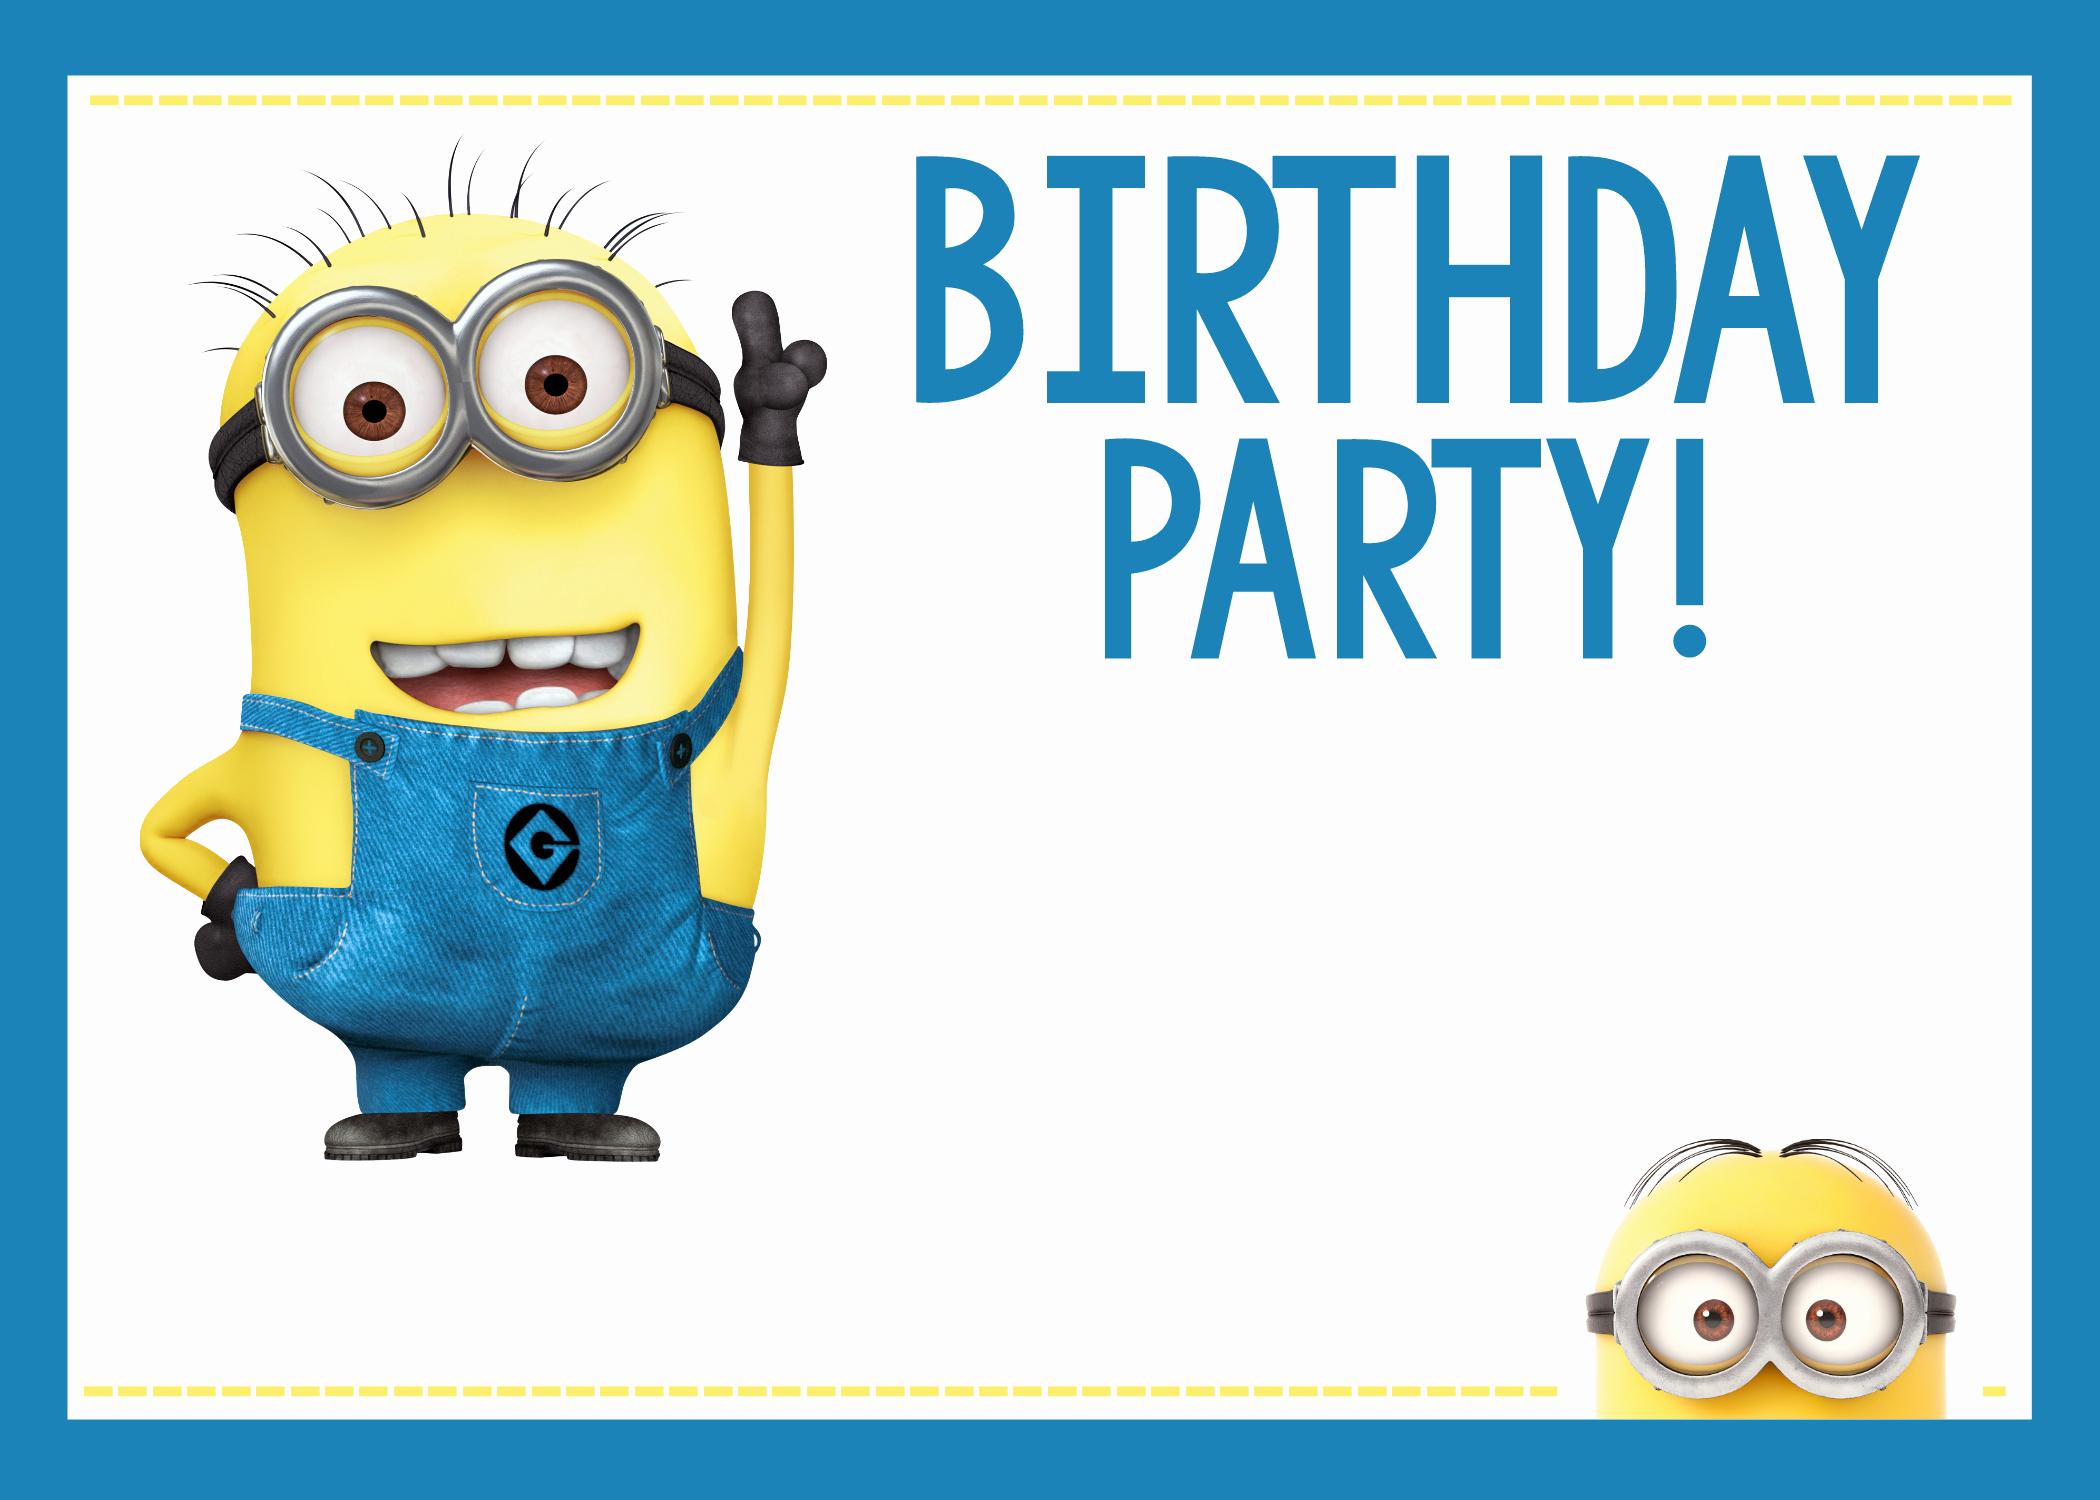 Minions Birthday Invitation Online New Fun Minion Party Ideas for A Birthday – Fun Squared